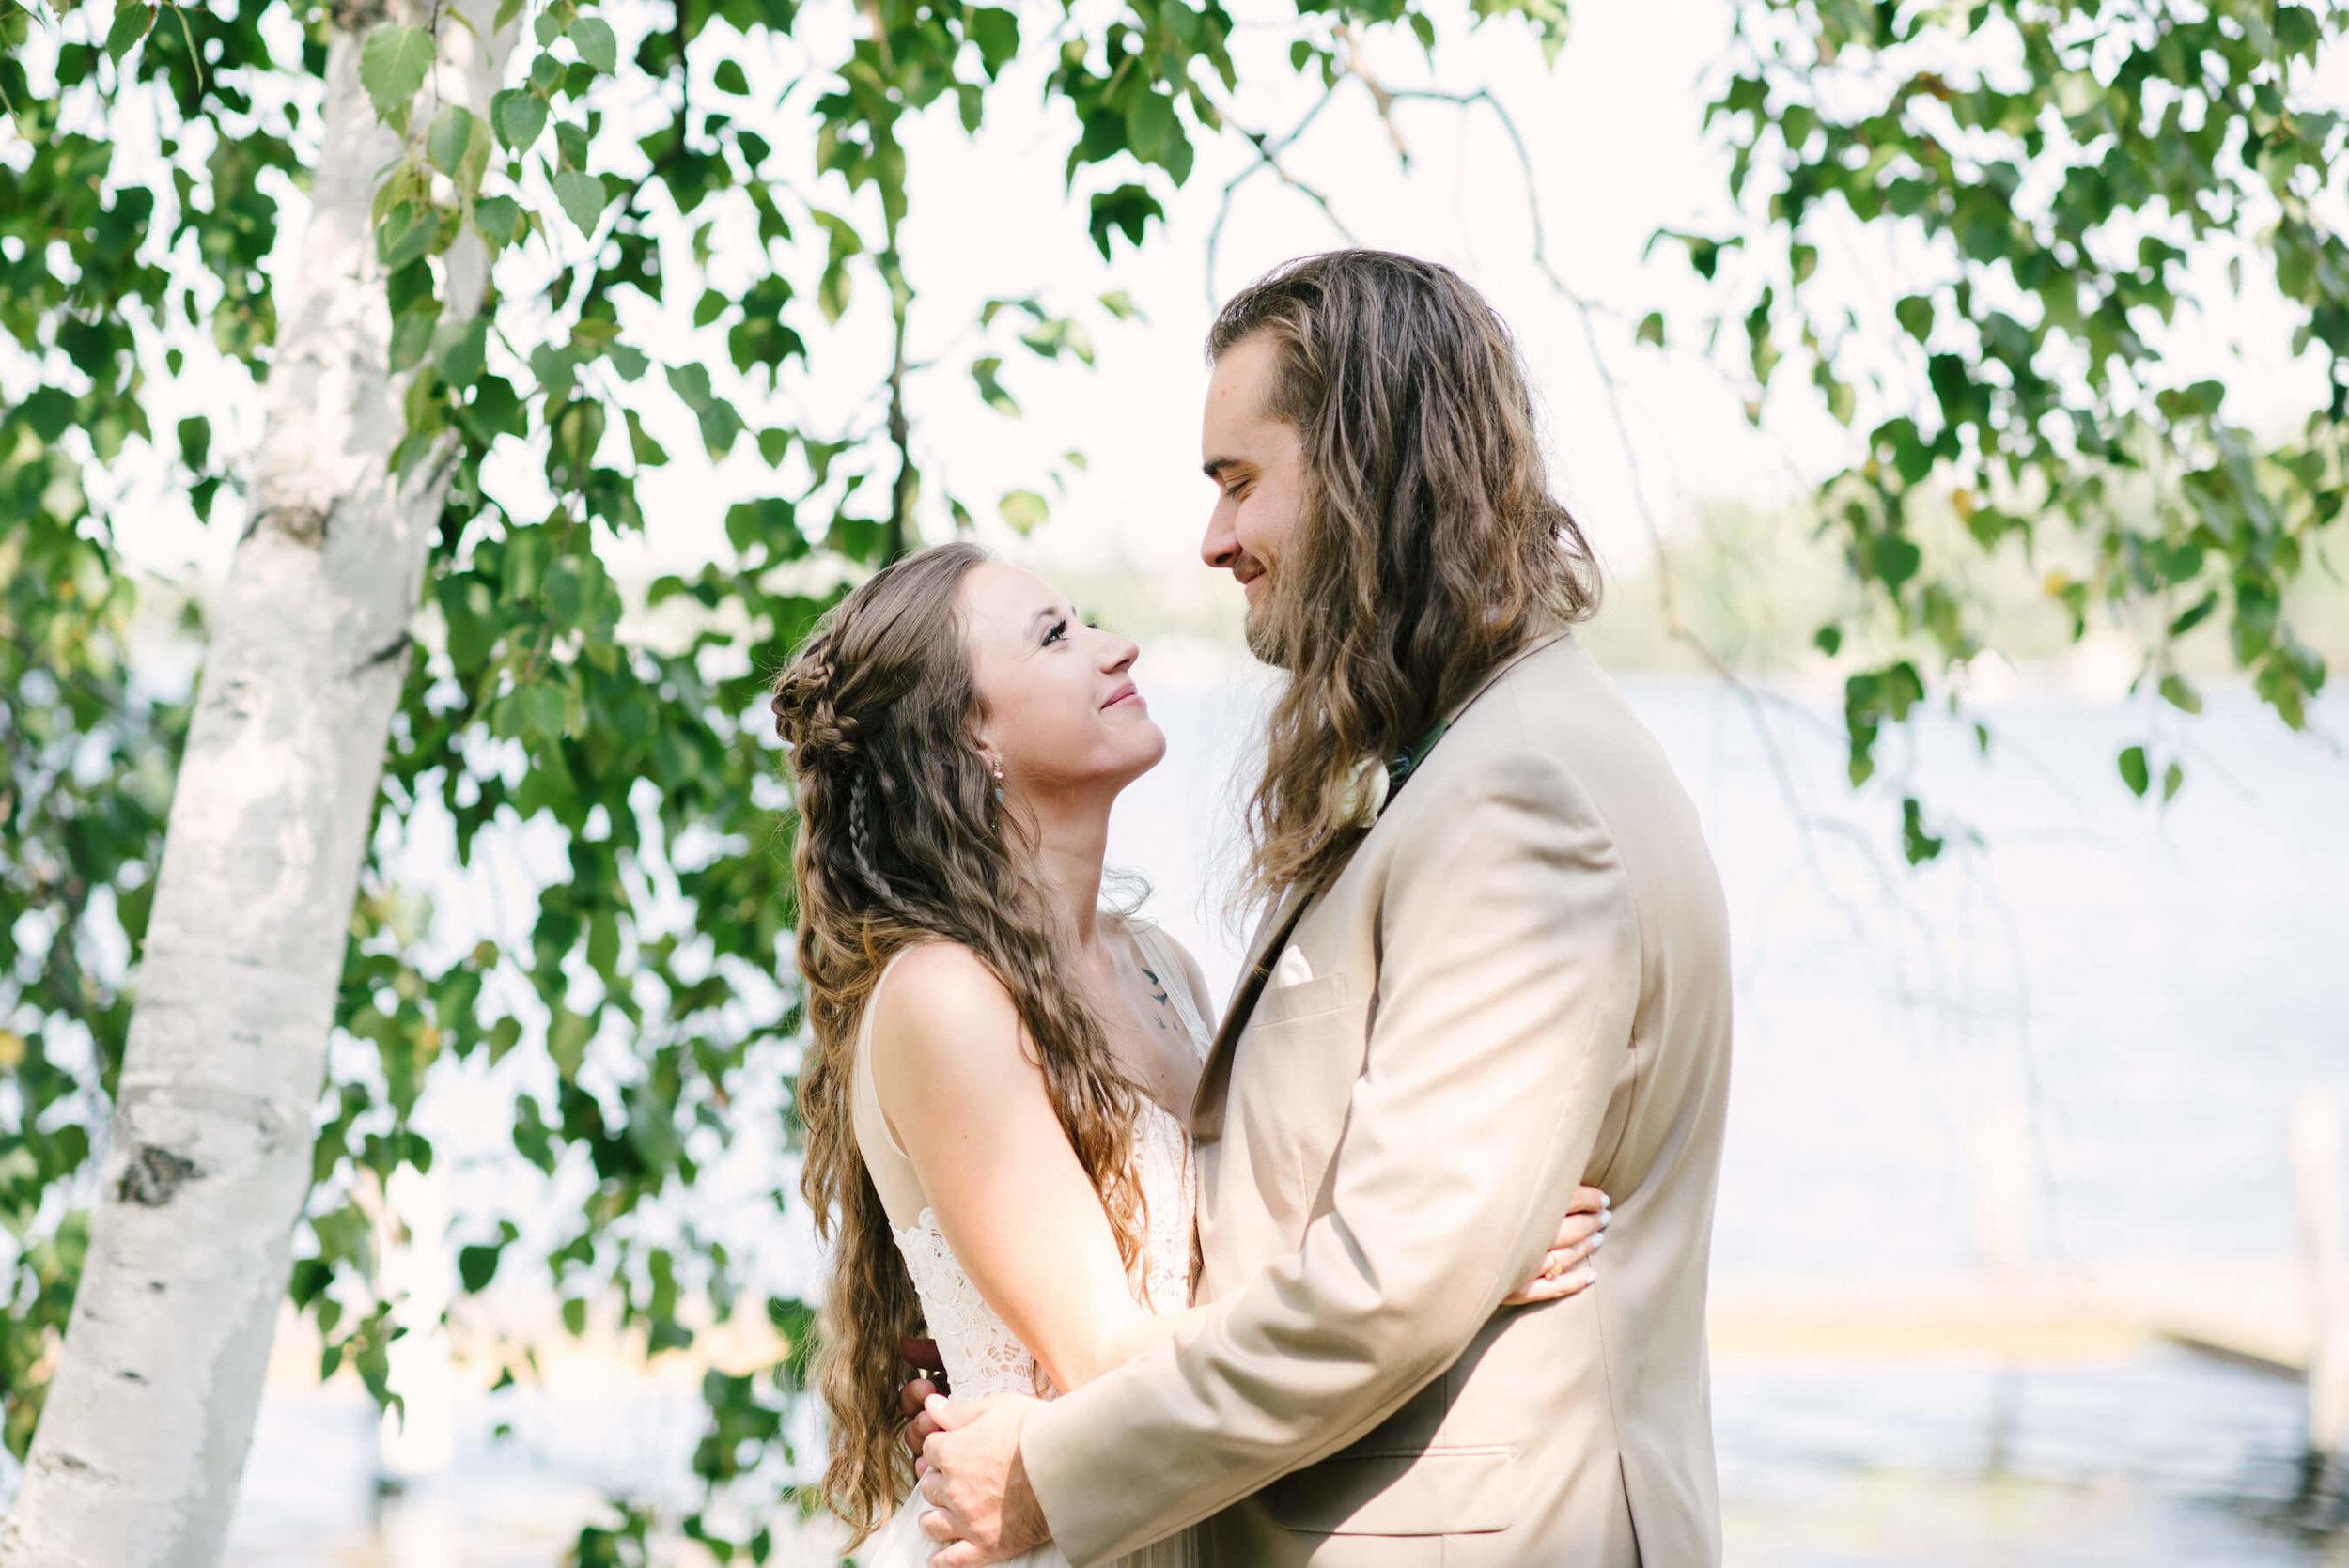 engle-olson-wedding-blair-taylor-15.jpg